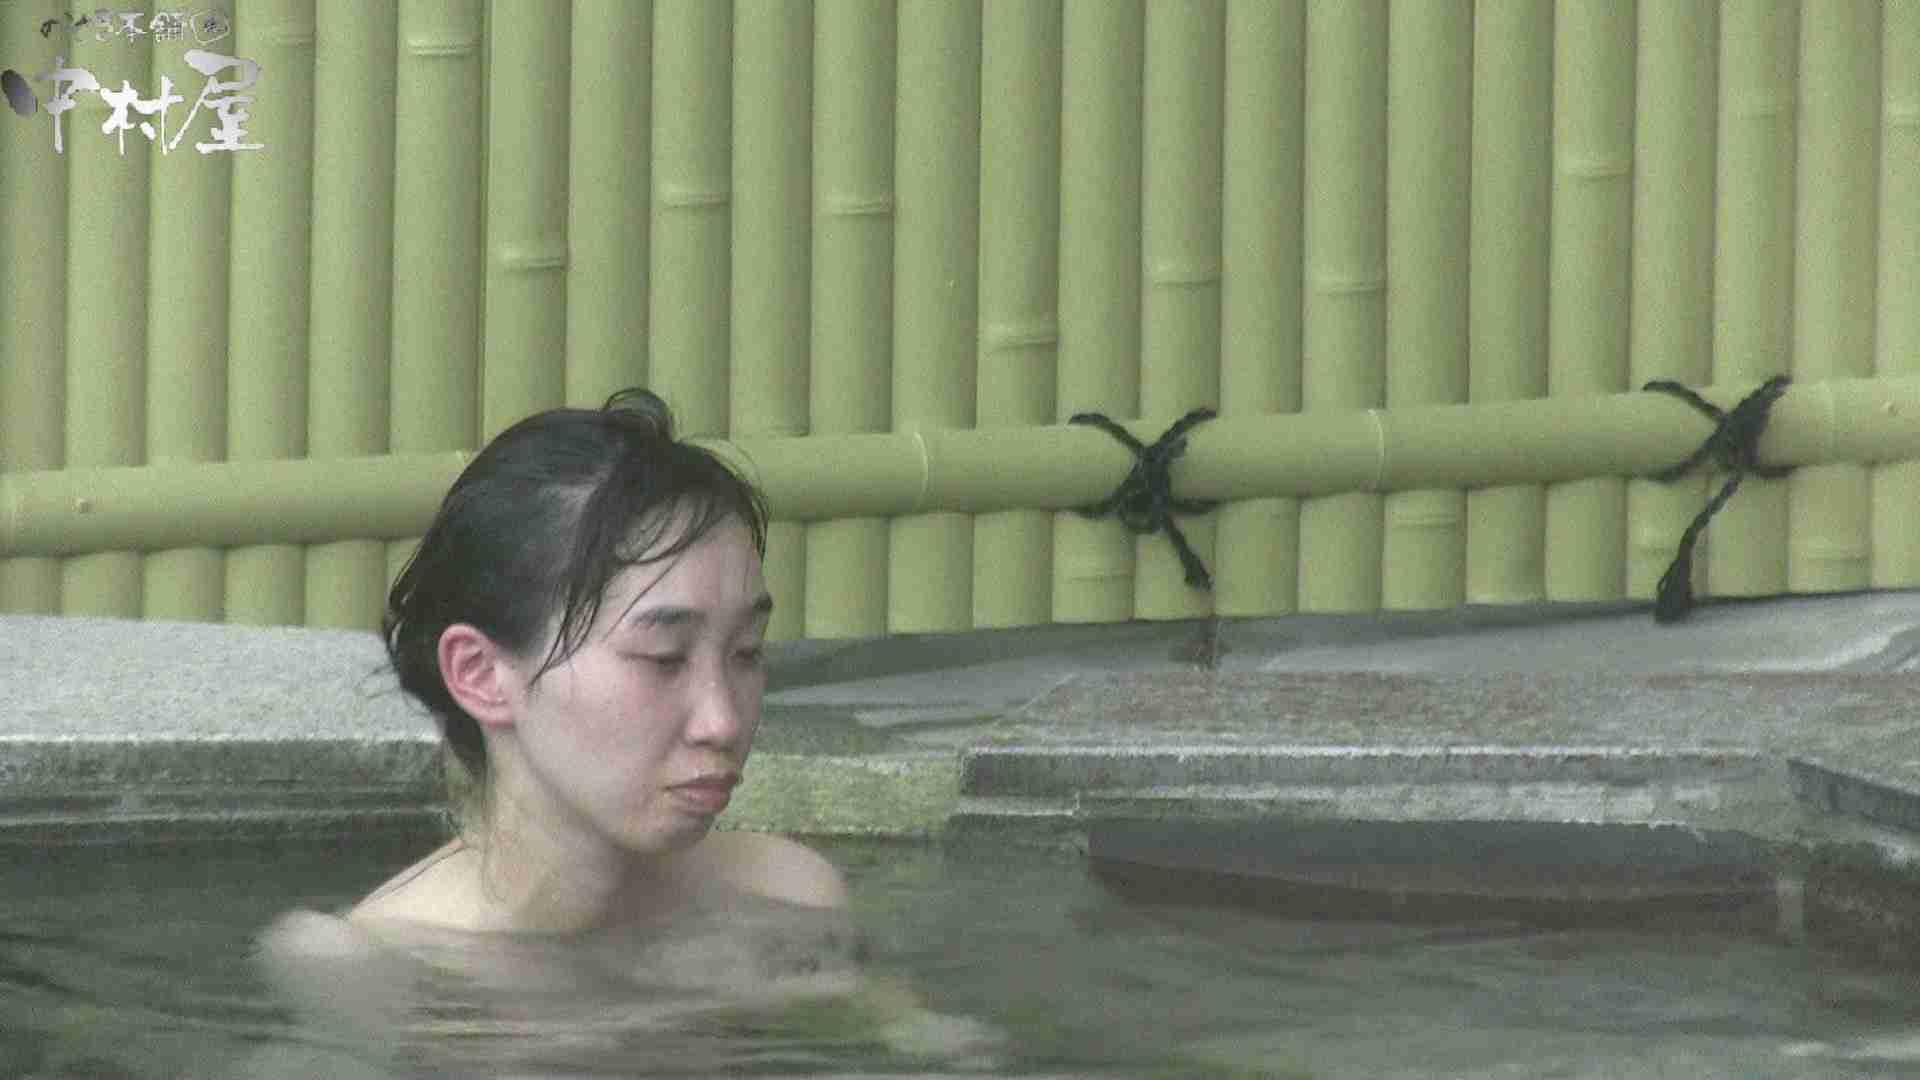 Aquaな露天風呂Vol.910 盗撮シリーズ | 露天風呂編  84PIX 21